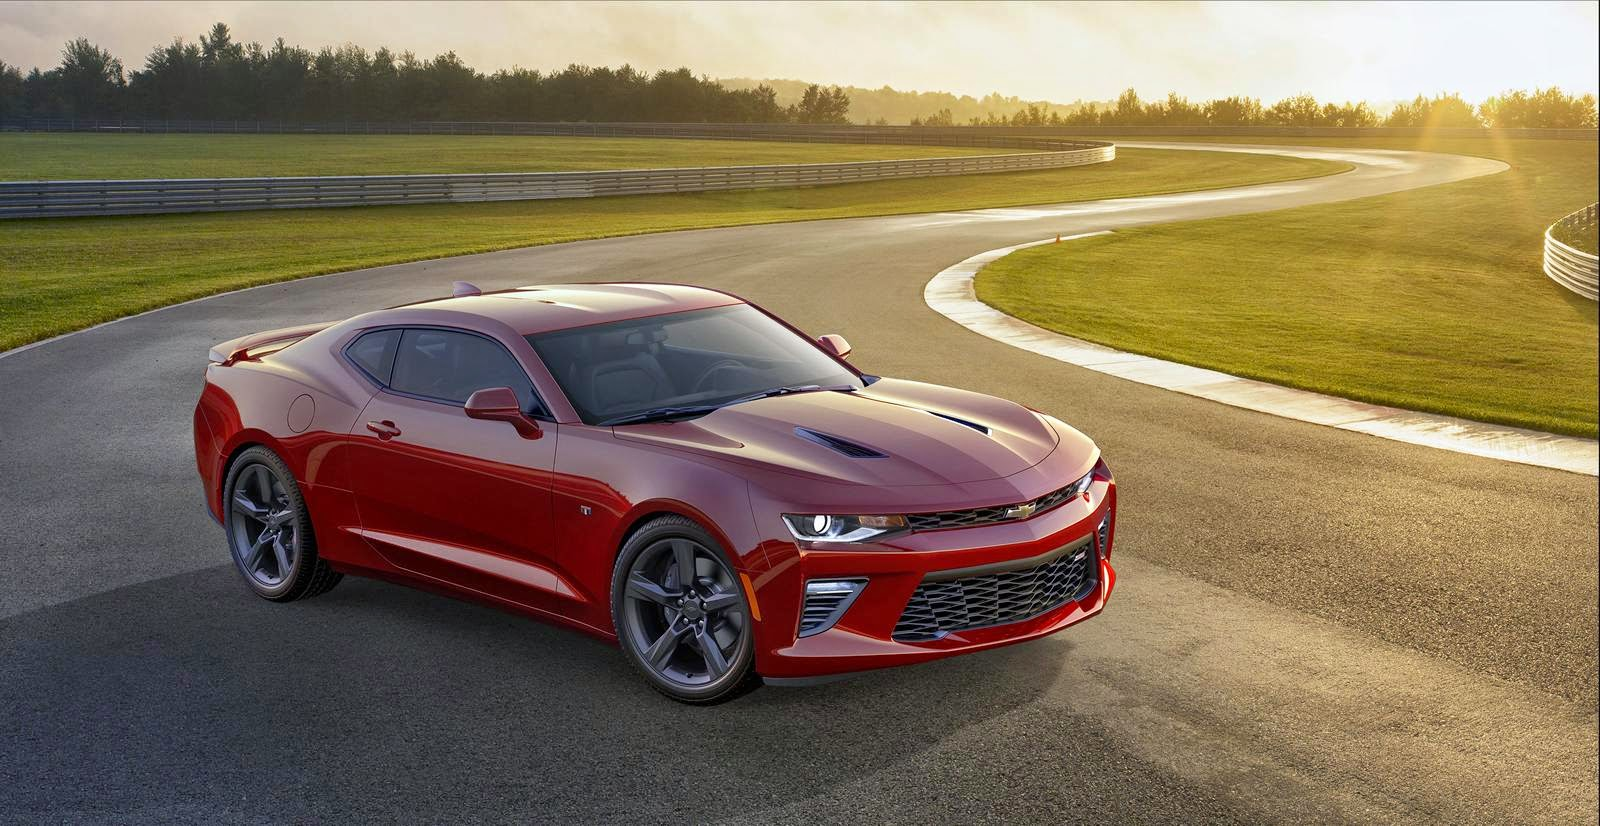 [Resim: Chevrolet%2BCamaro%2B4.jpg]